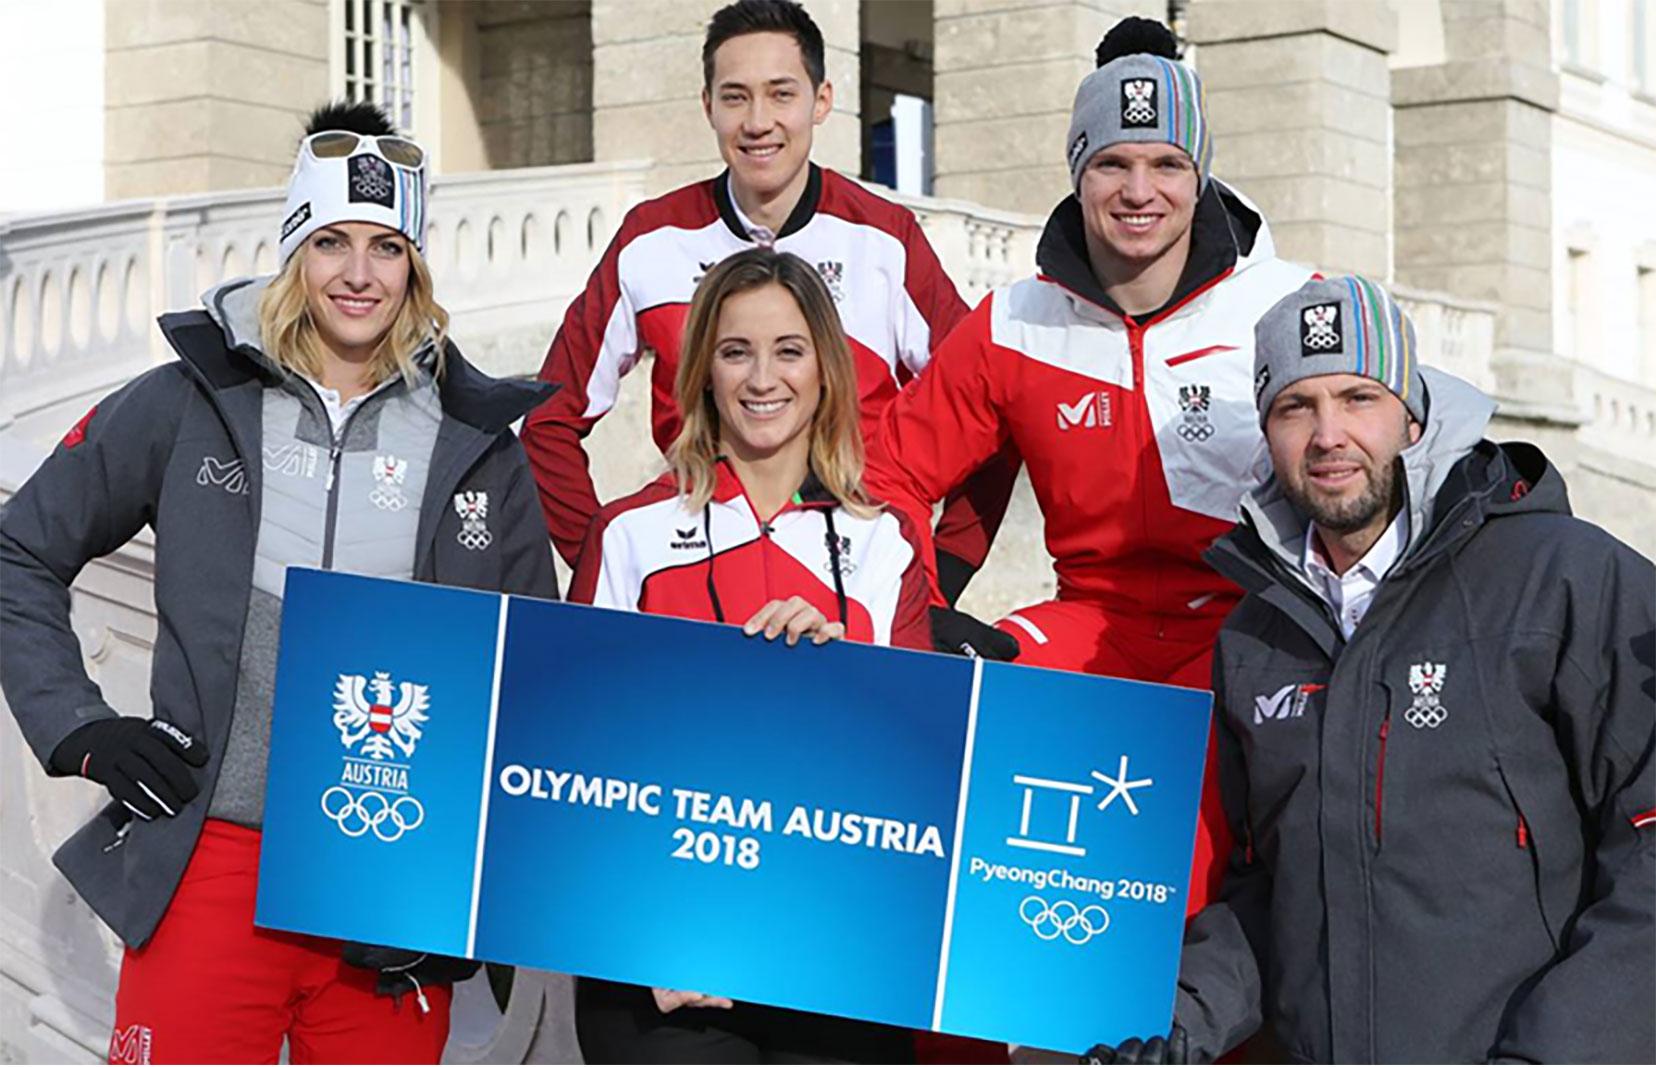 Olympic team